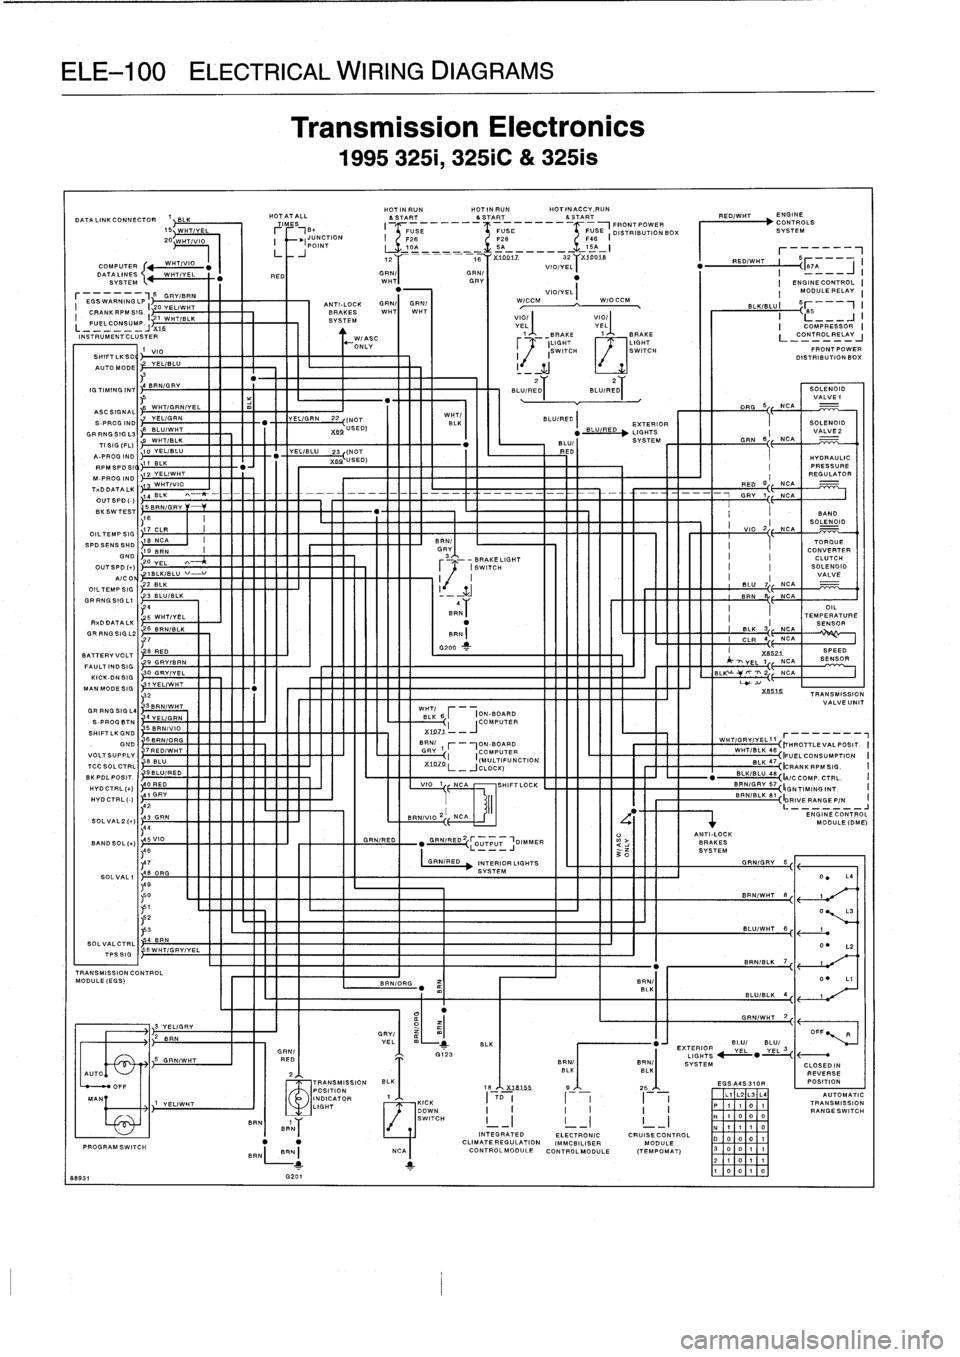 Brakes Bmw 325i 1992 E36 Workshop Manual Airbag Wiring Diagram Page 584